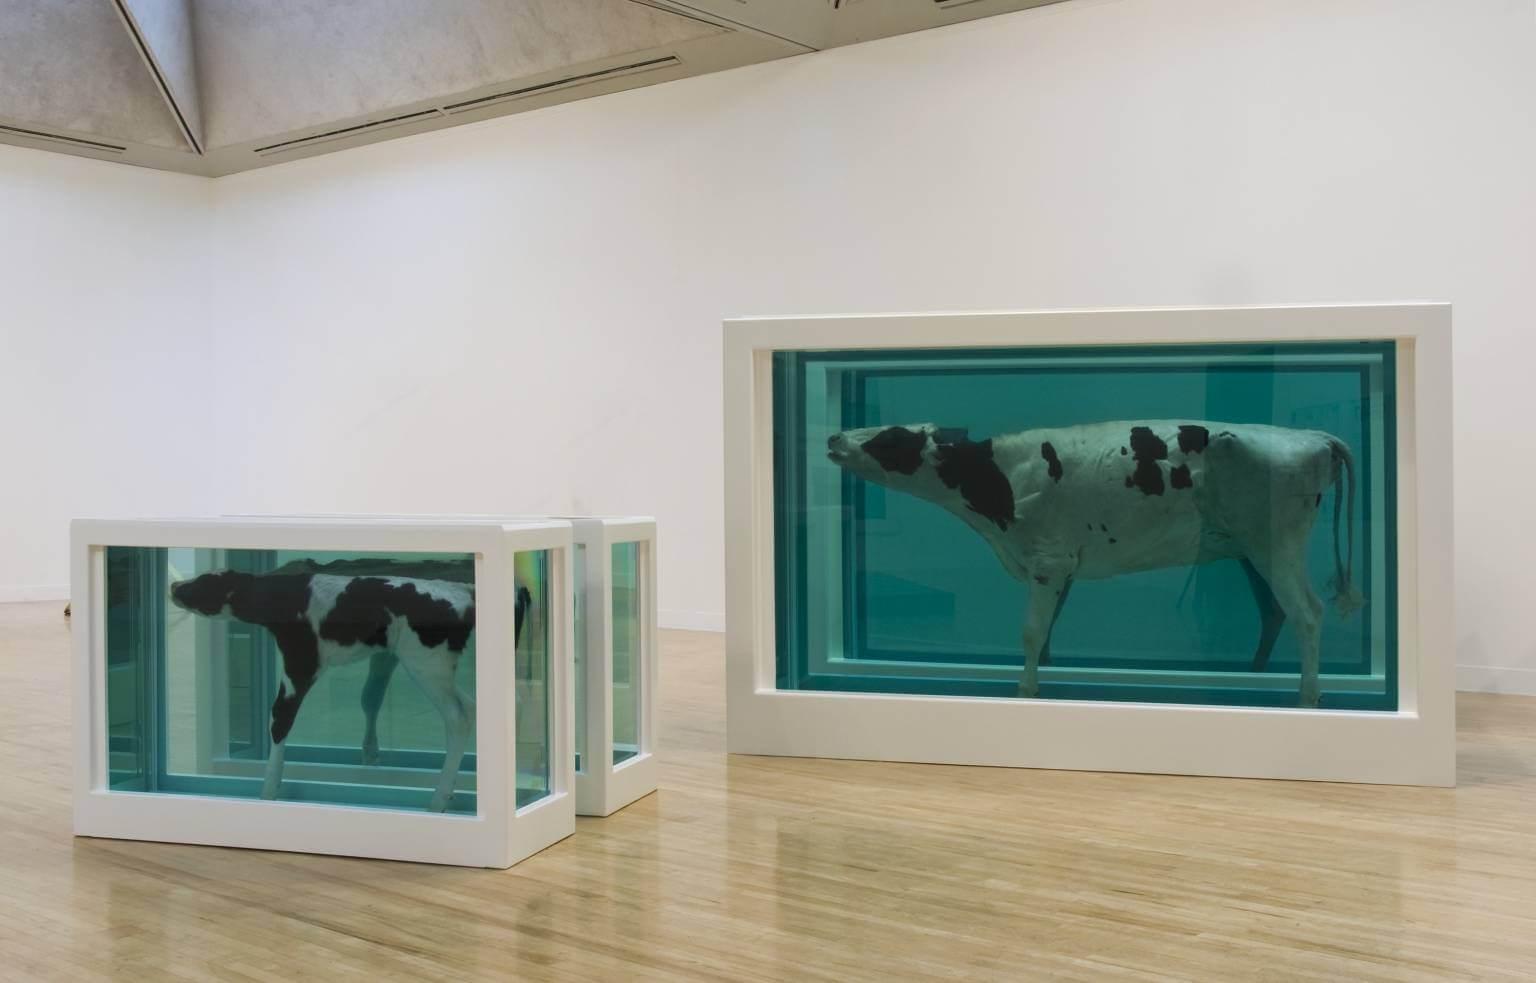 Obras de Damien Hirst pierden valor